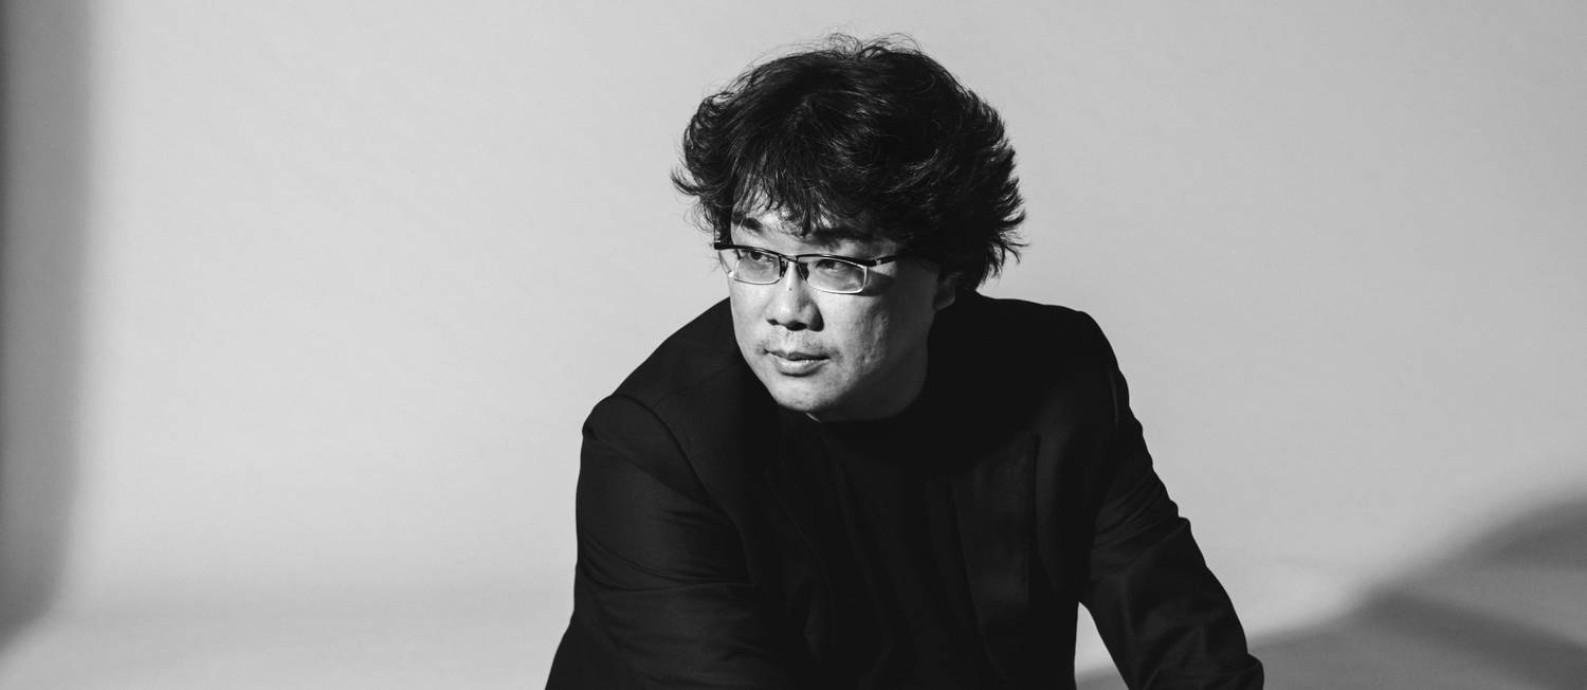 Bong Joon-ho, diretor de Parasita Foto: New York Times/PHILIP CHEUNG / NYT